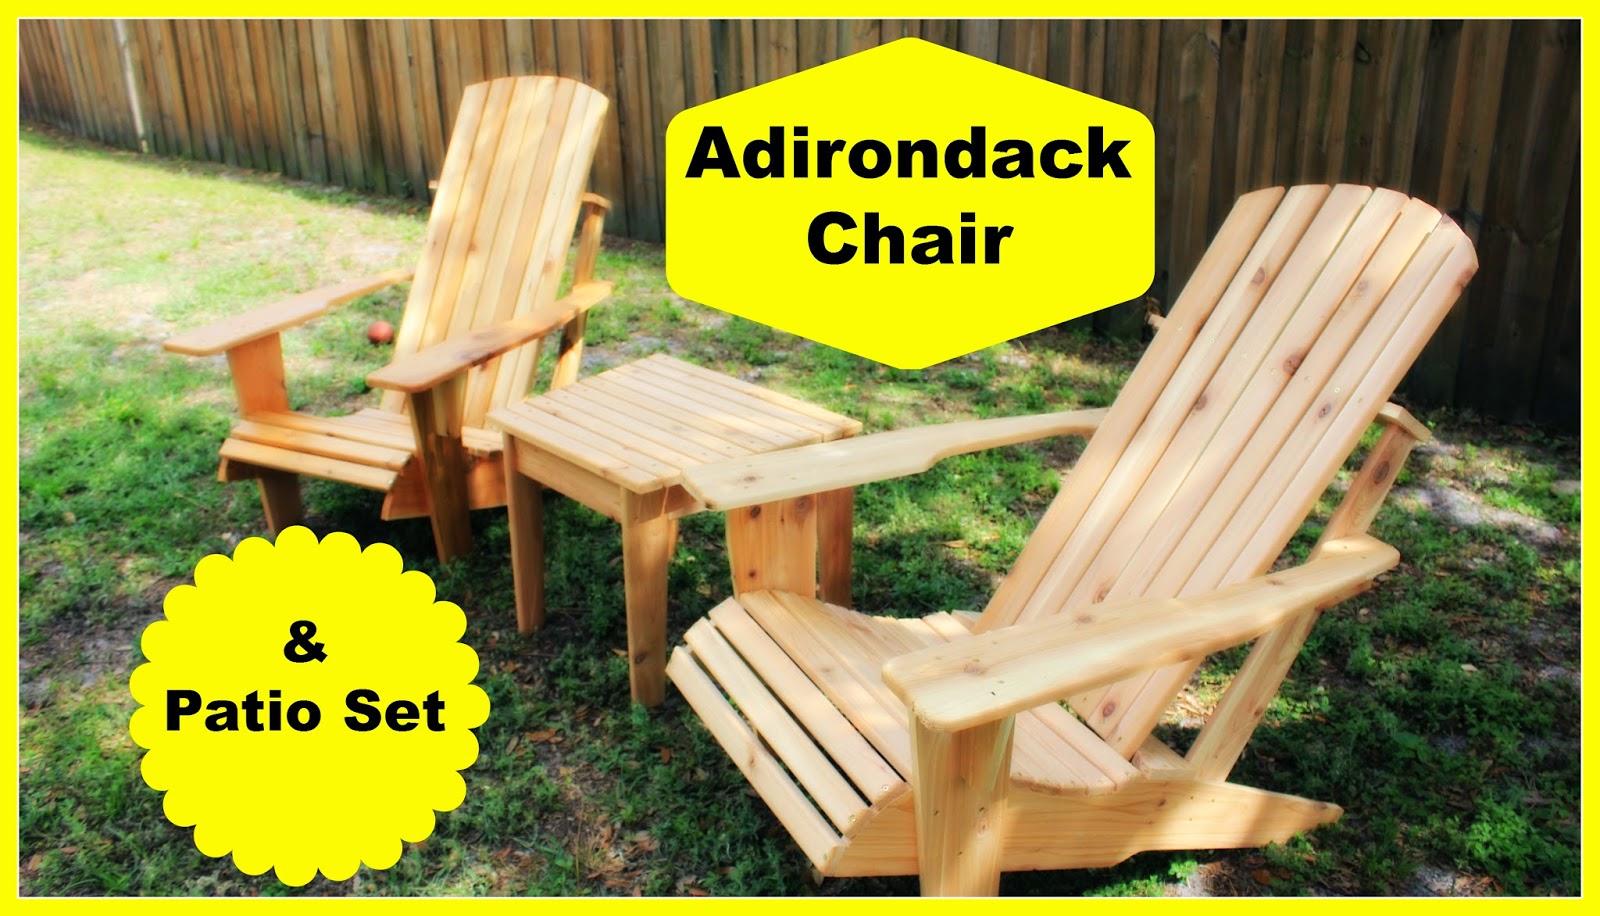 Cedar Adirondack Chair and Patio Set Part 2